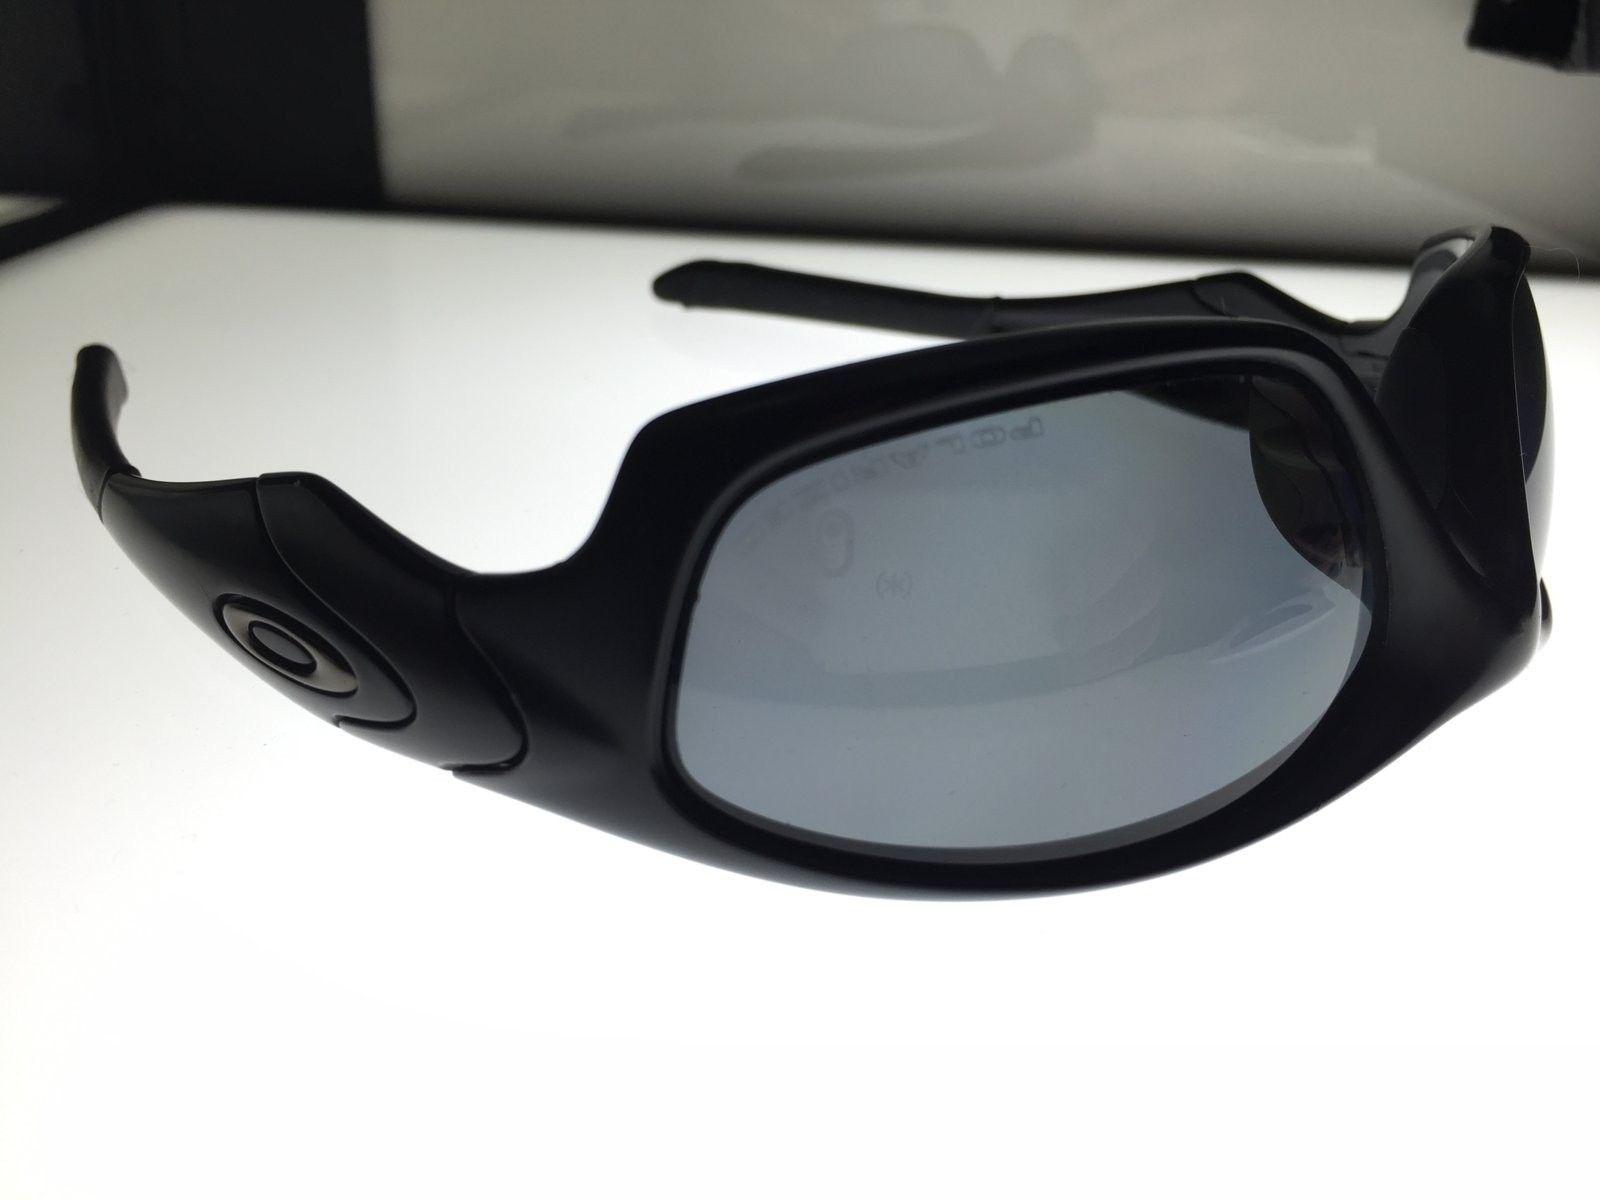 New Straight Jacket II mate black w/ grey polarized SKU: 24-124 - $100 - image.jpeg